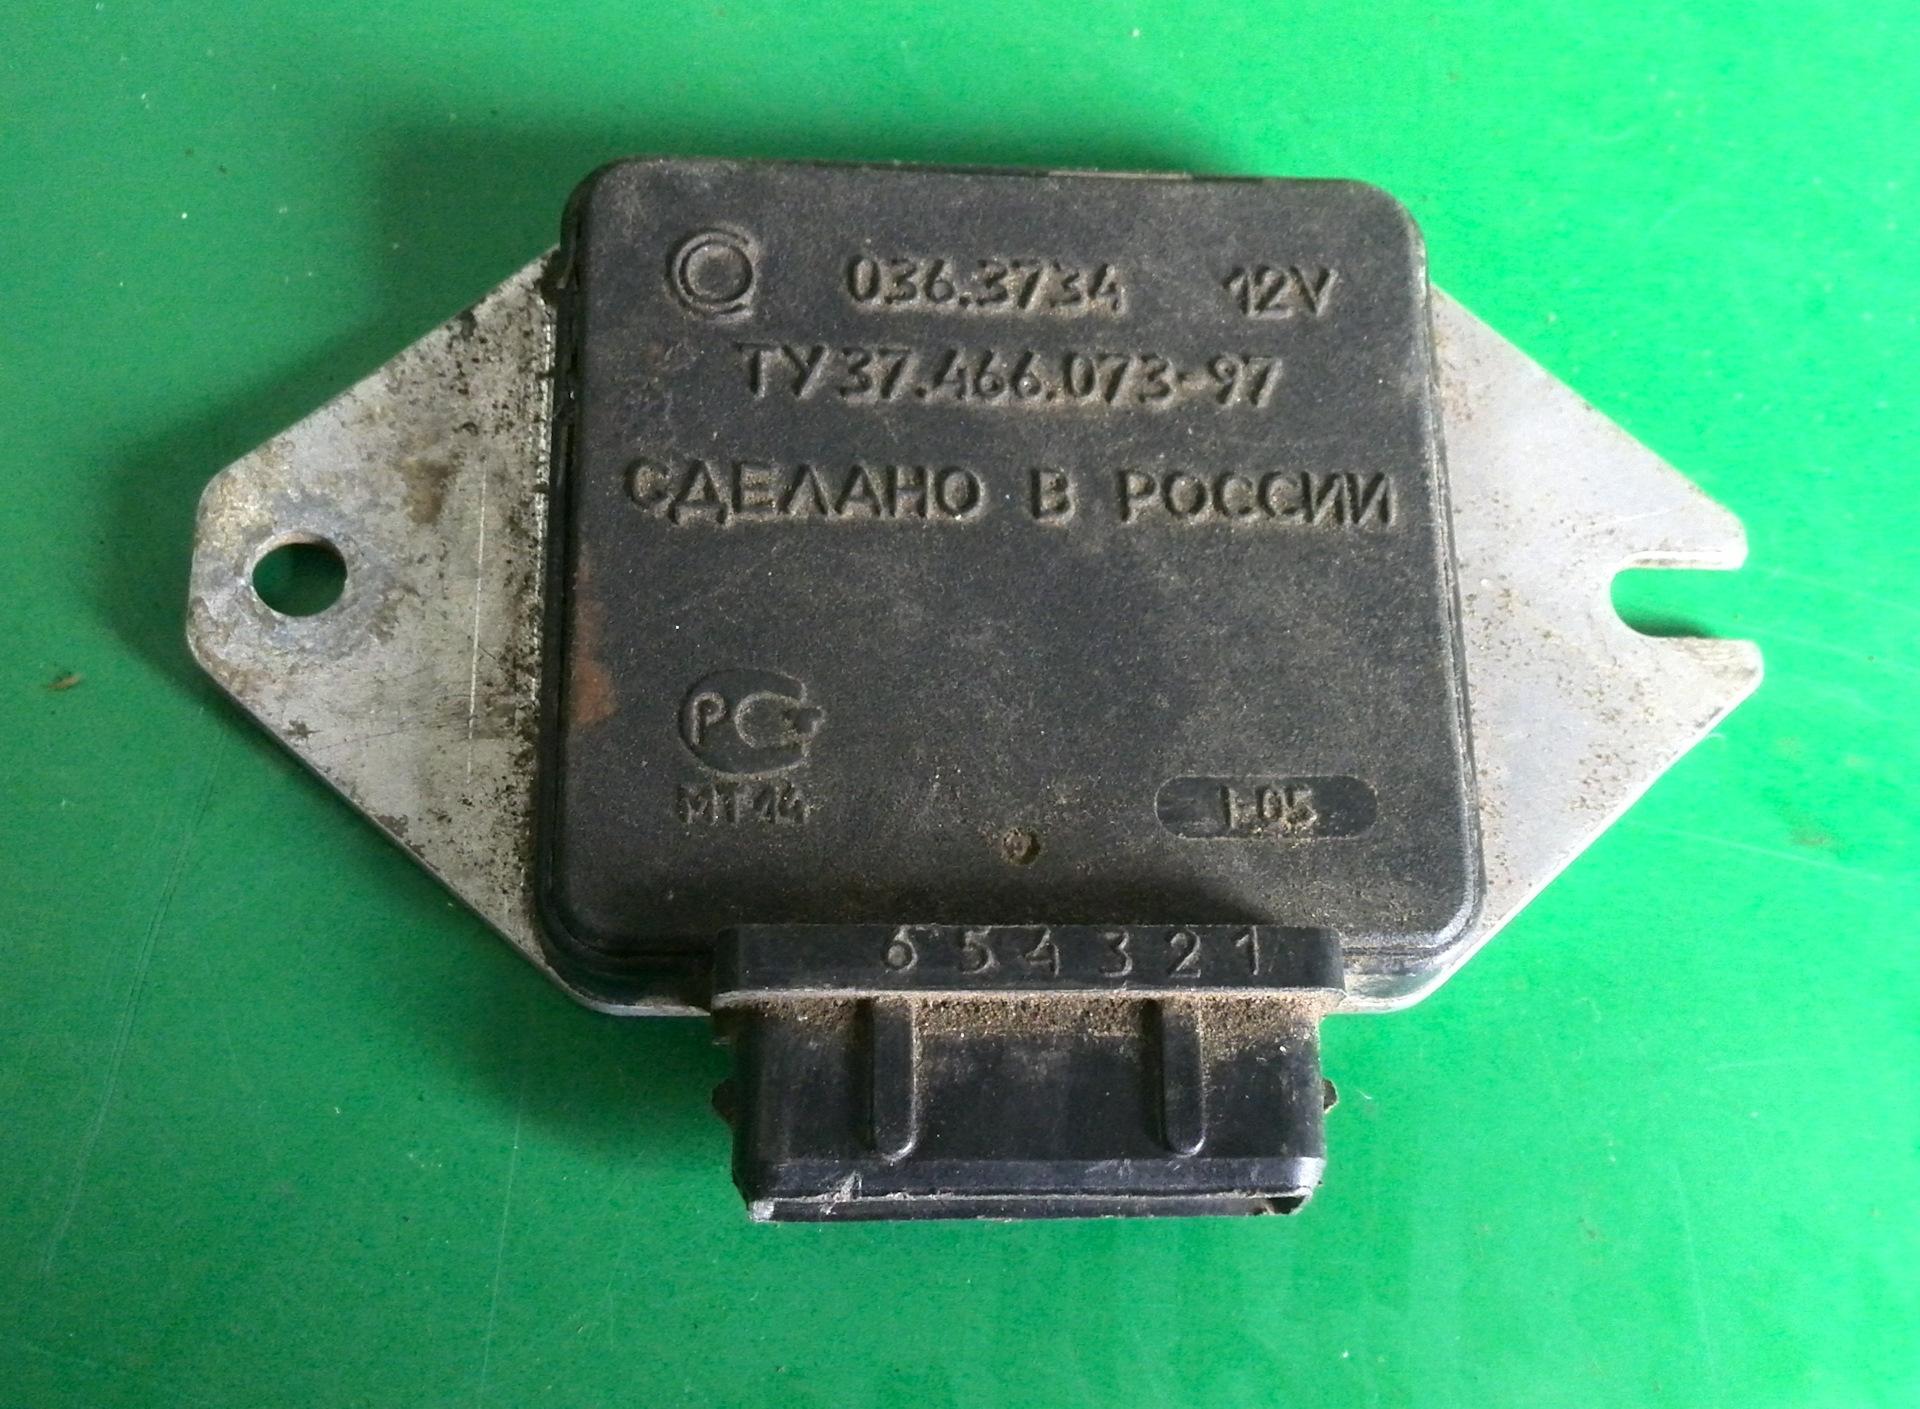 bbd0501s-1920.jpg